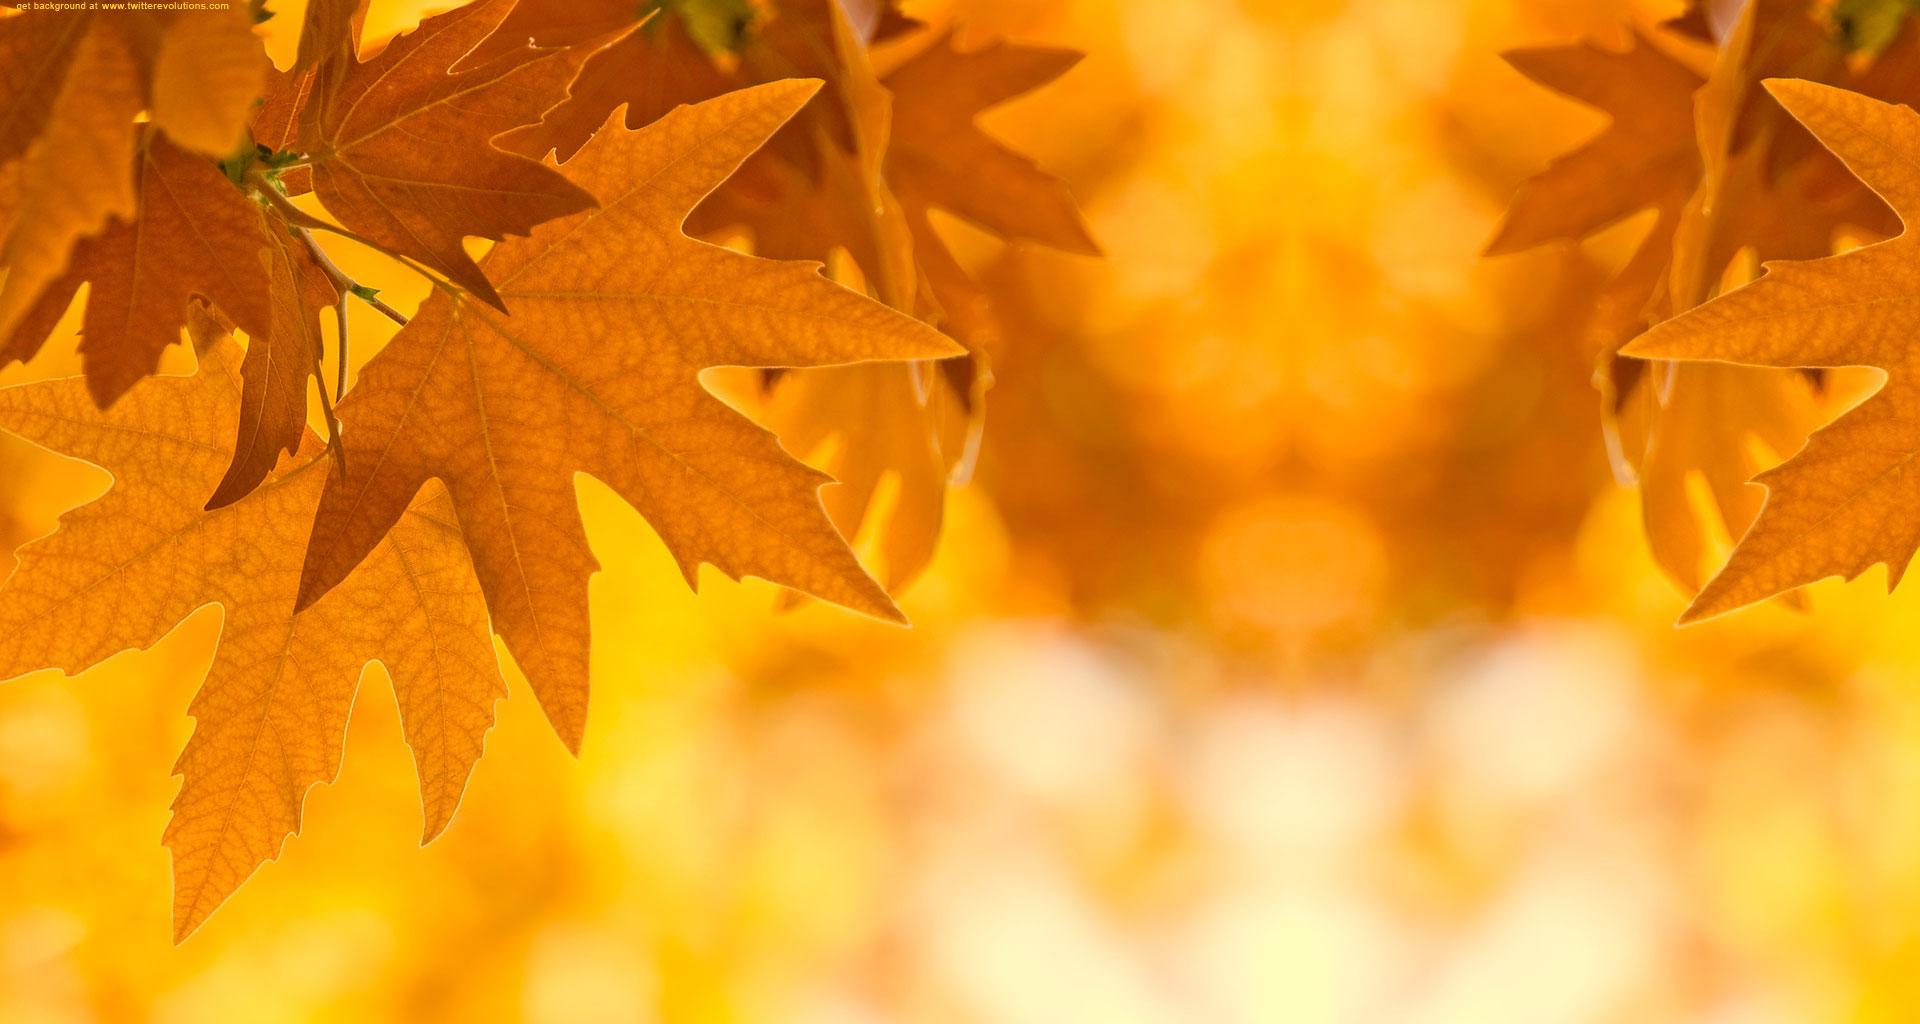 Hd Autumn Desktop Wallpaper Awesome Autumn Photo 12353 Hdwpro